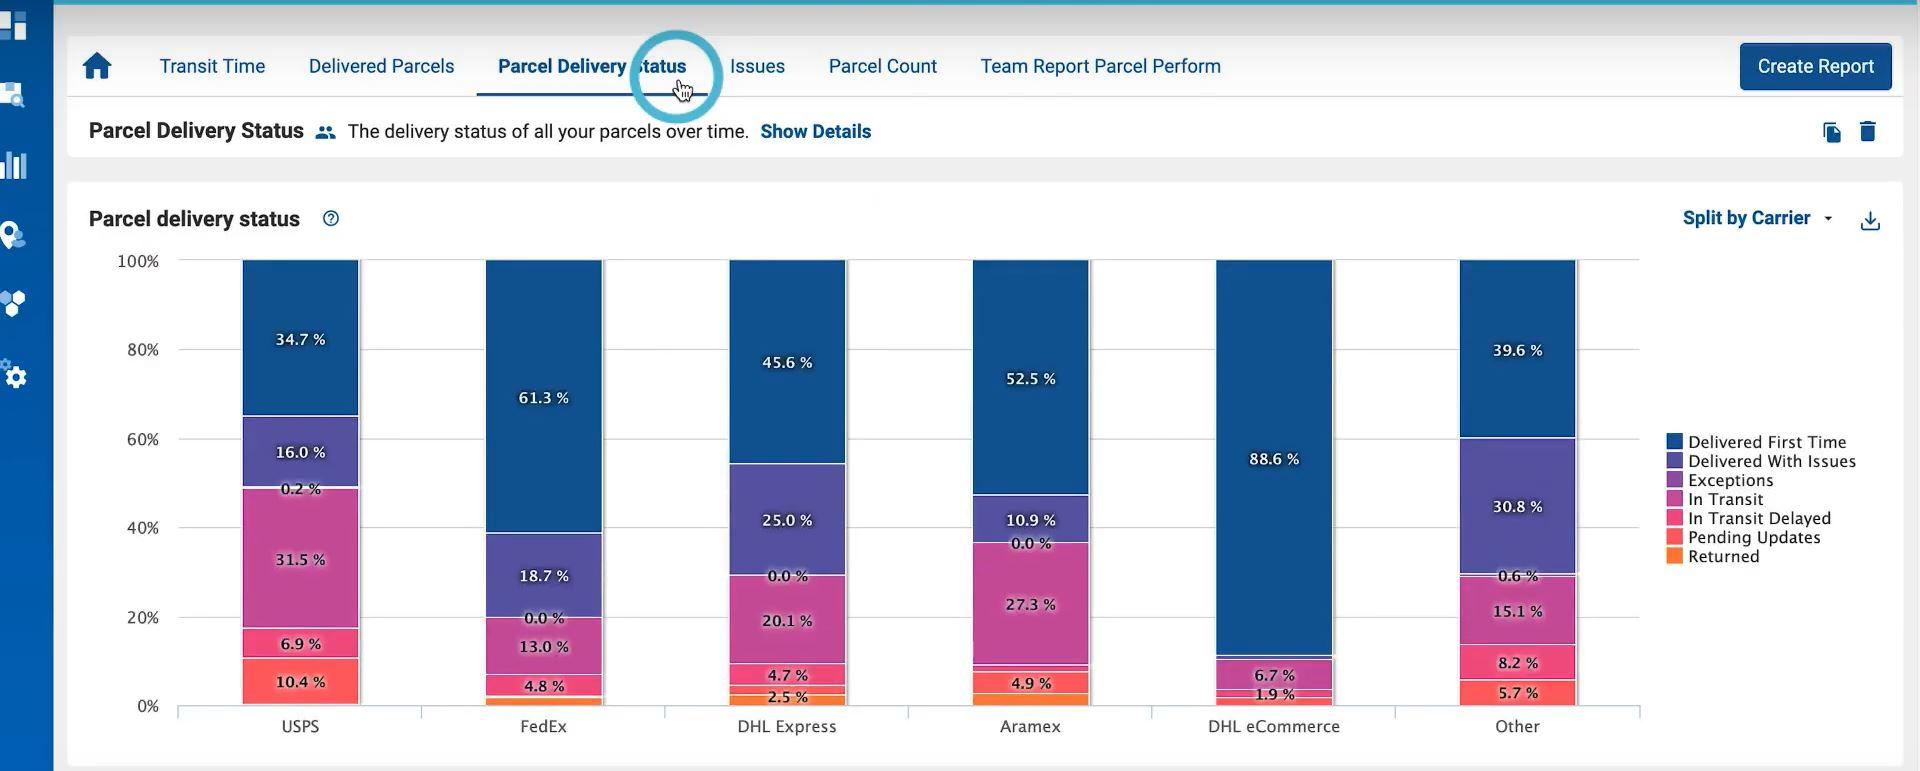 Parcel Perform Software - 6